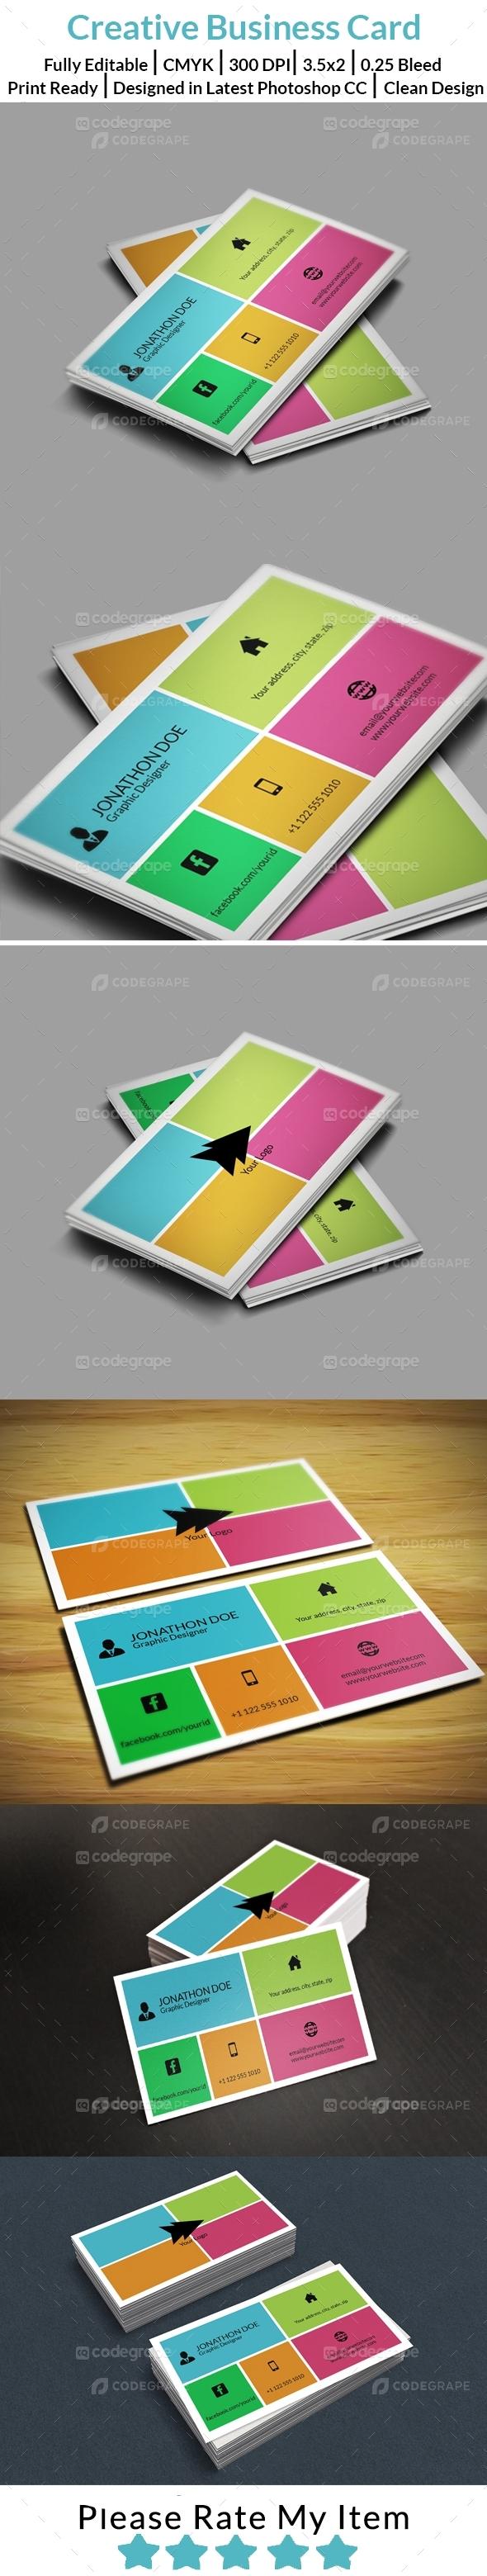 Creative Square Business Card